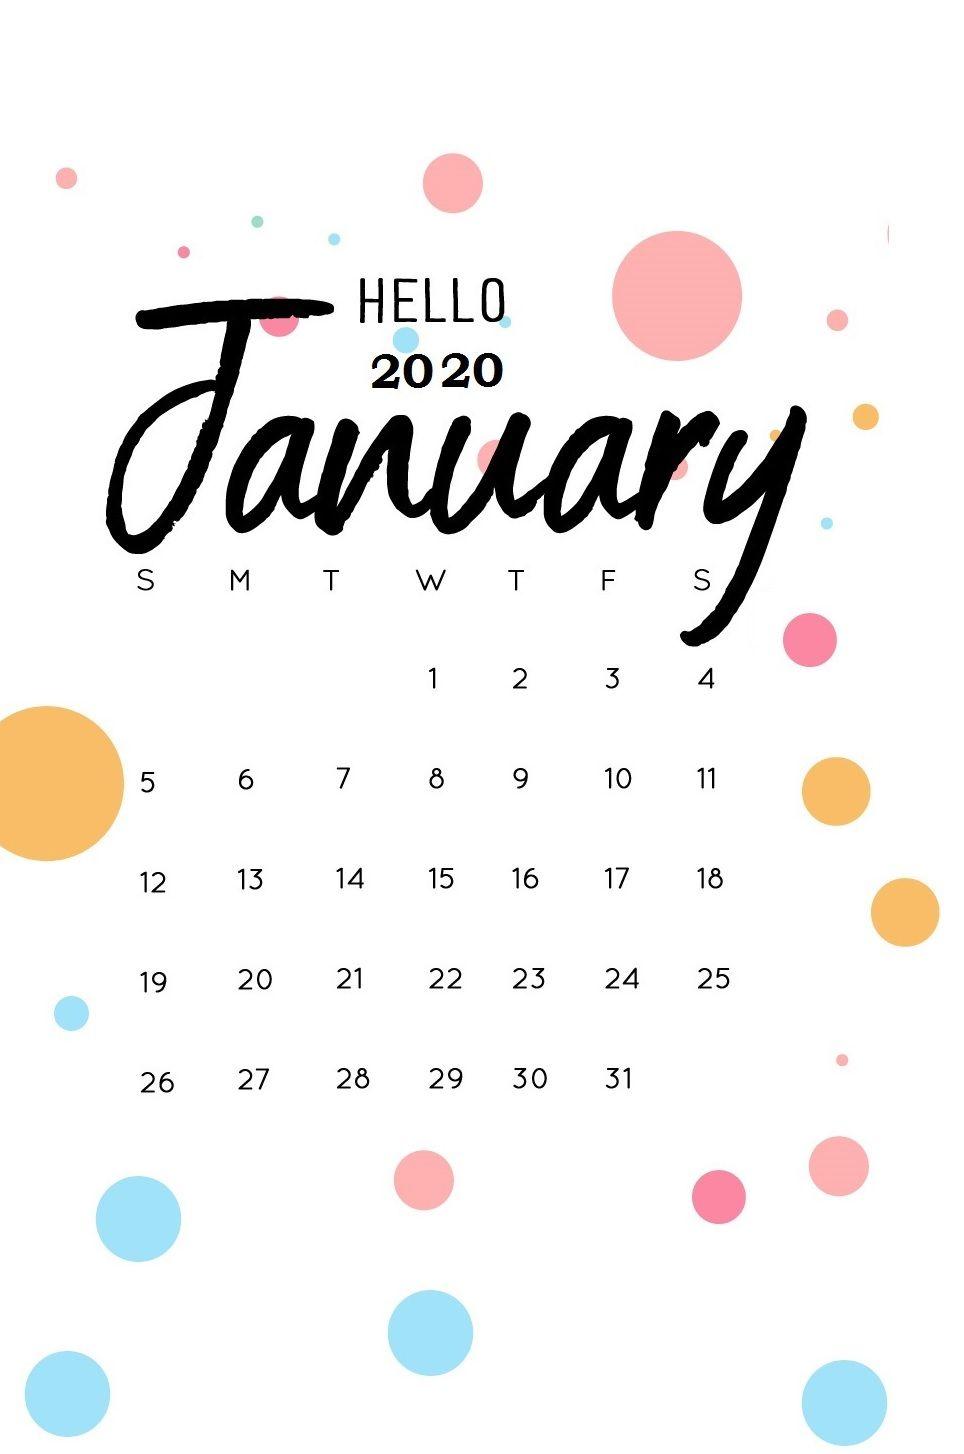 iPhone January 2020 Calendar Papeis de parede